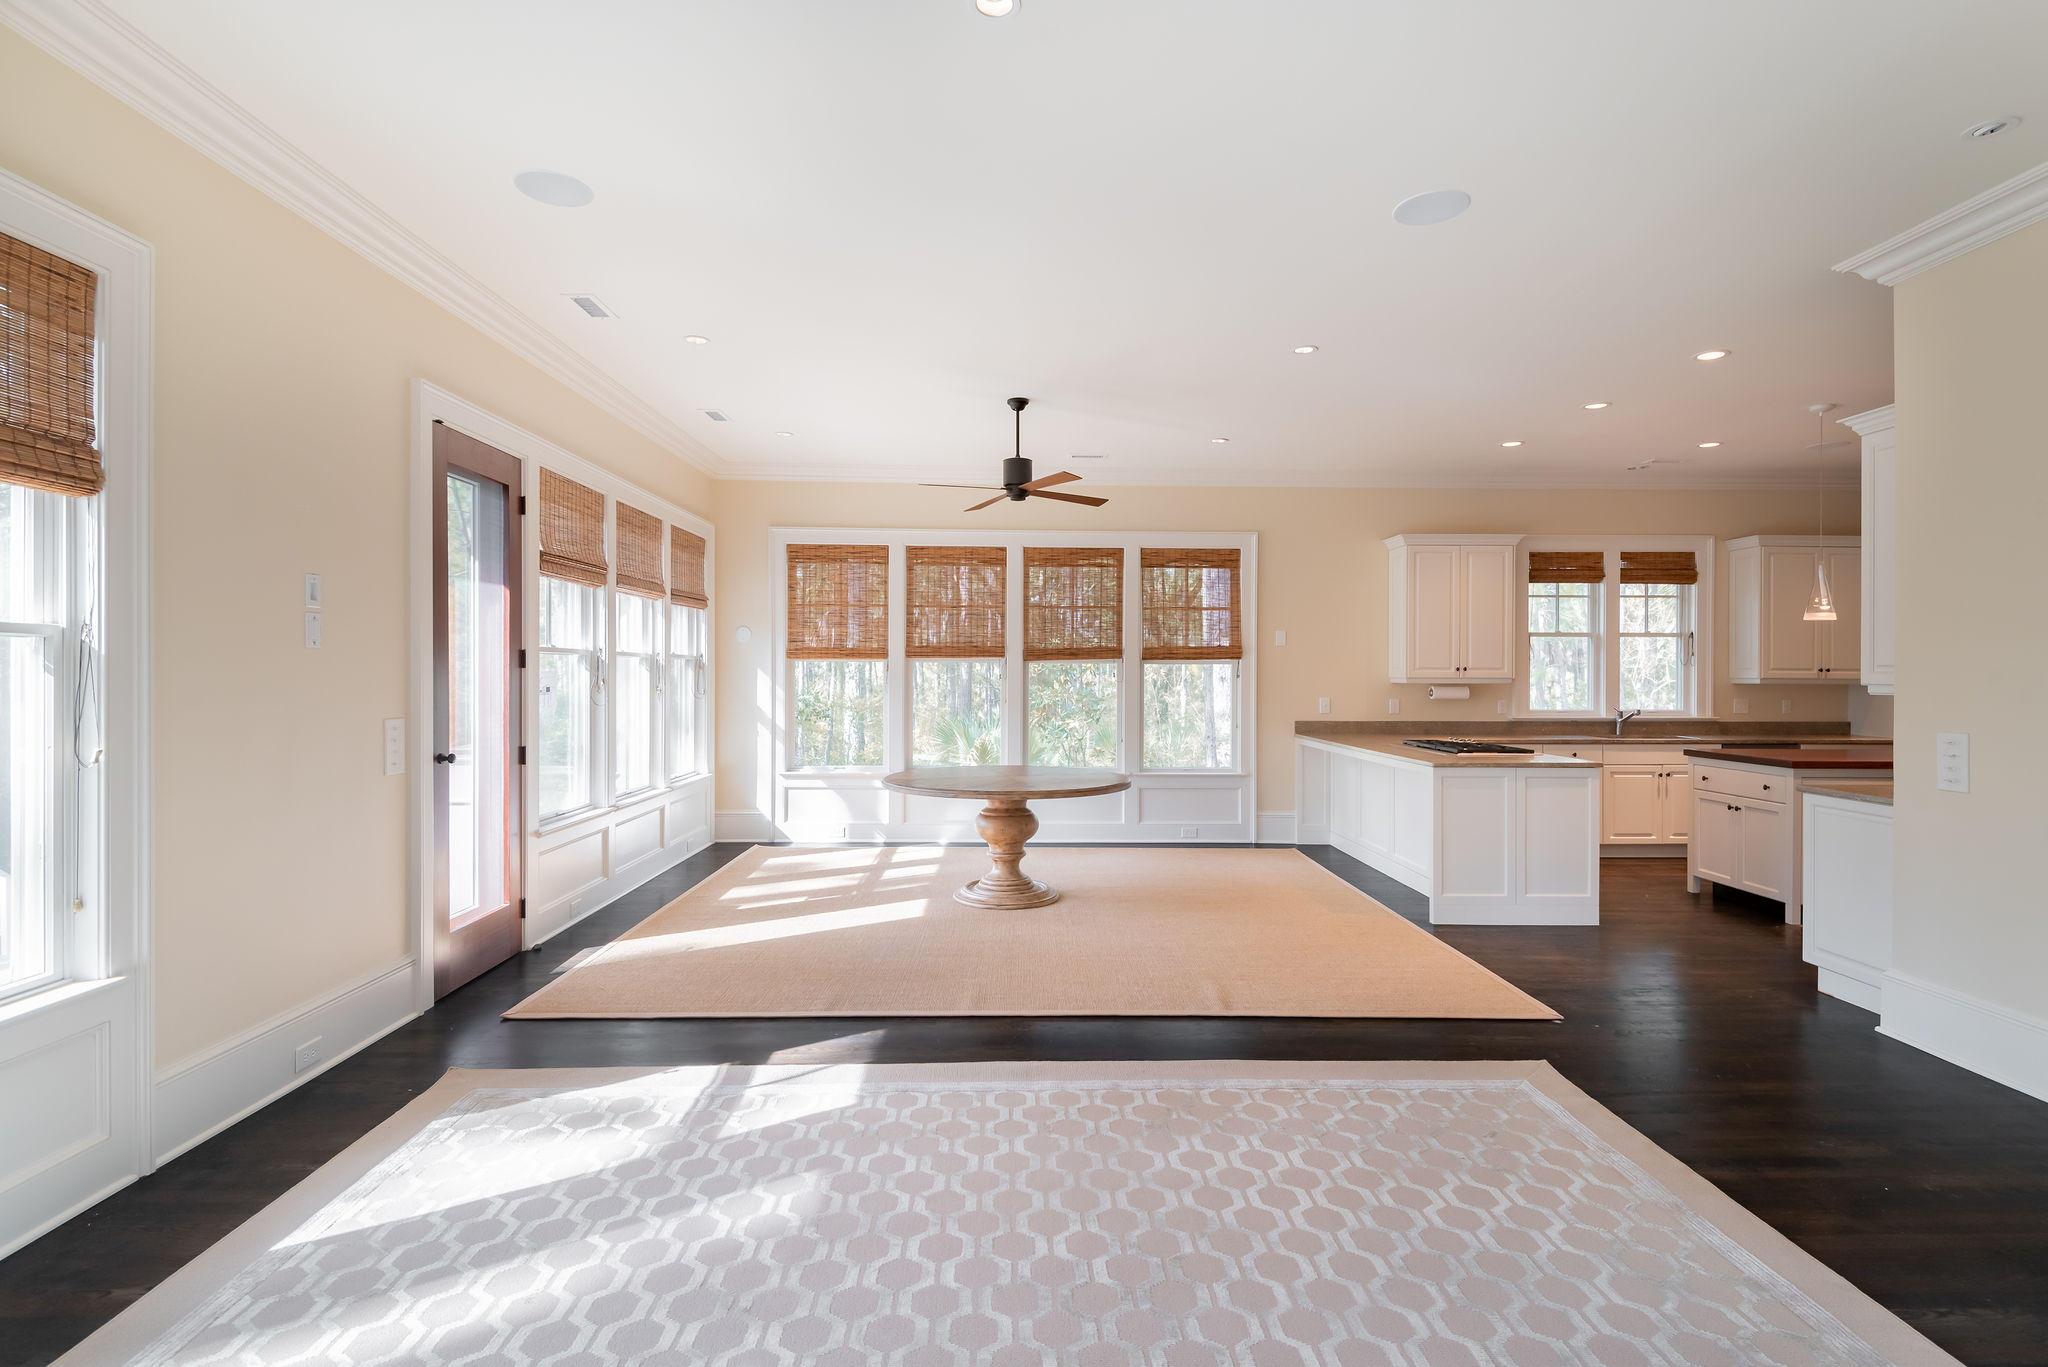 Kiawah Island Homes For Sale - 3 Grey Widgeon, Kiawah Island, SC - 62